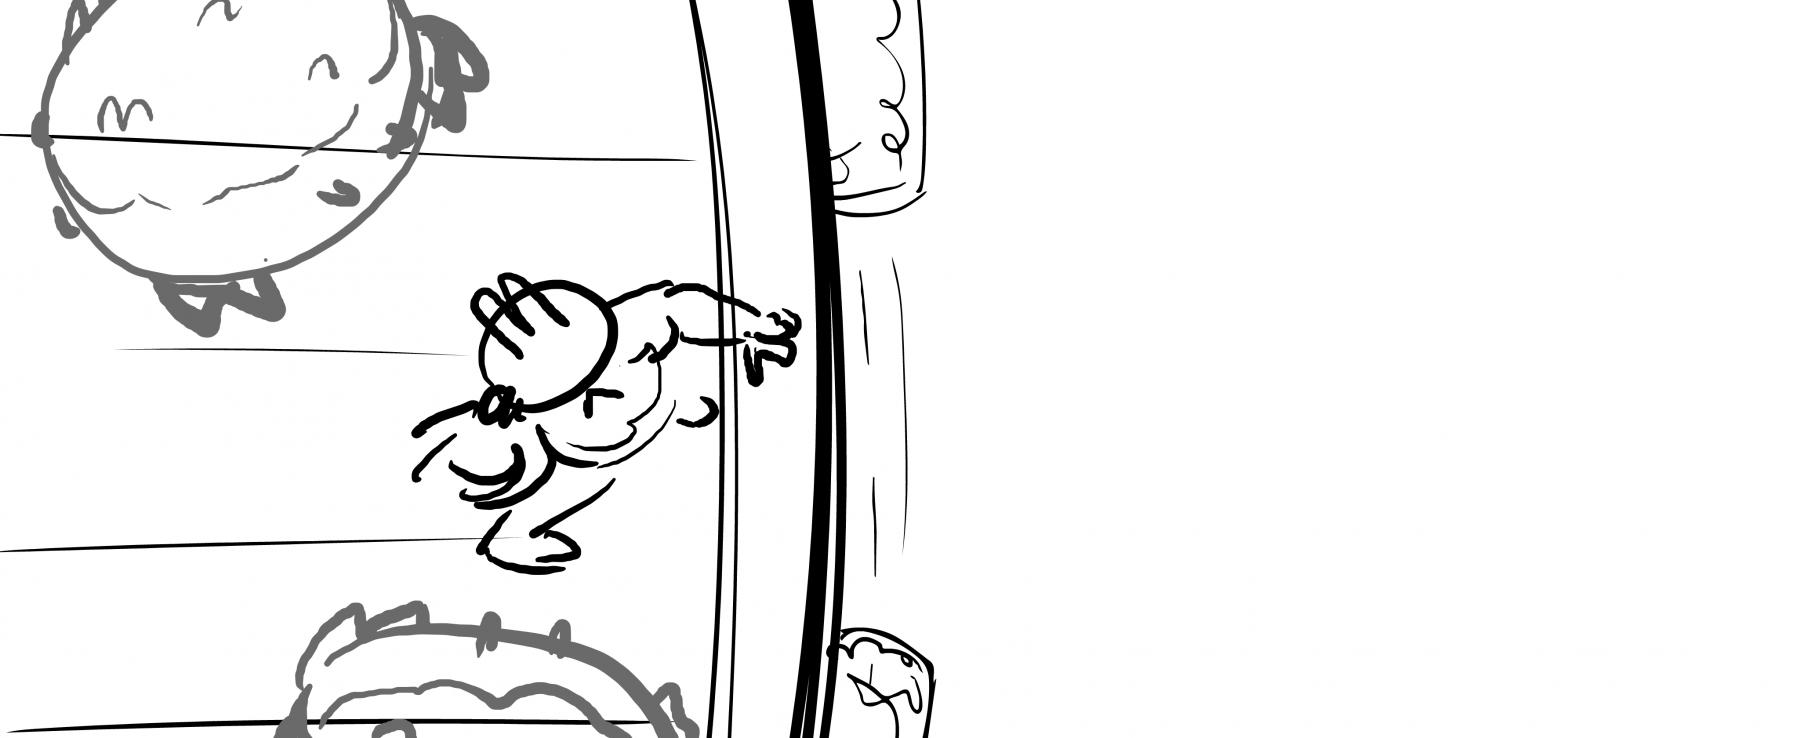 Nut-Thumbnail-Rough-Board00341